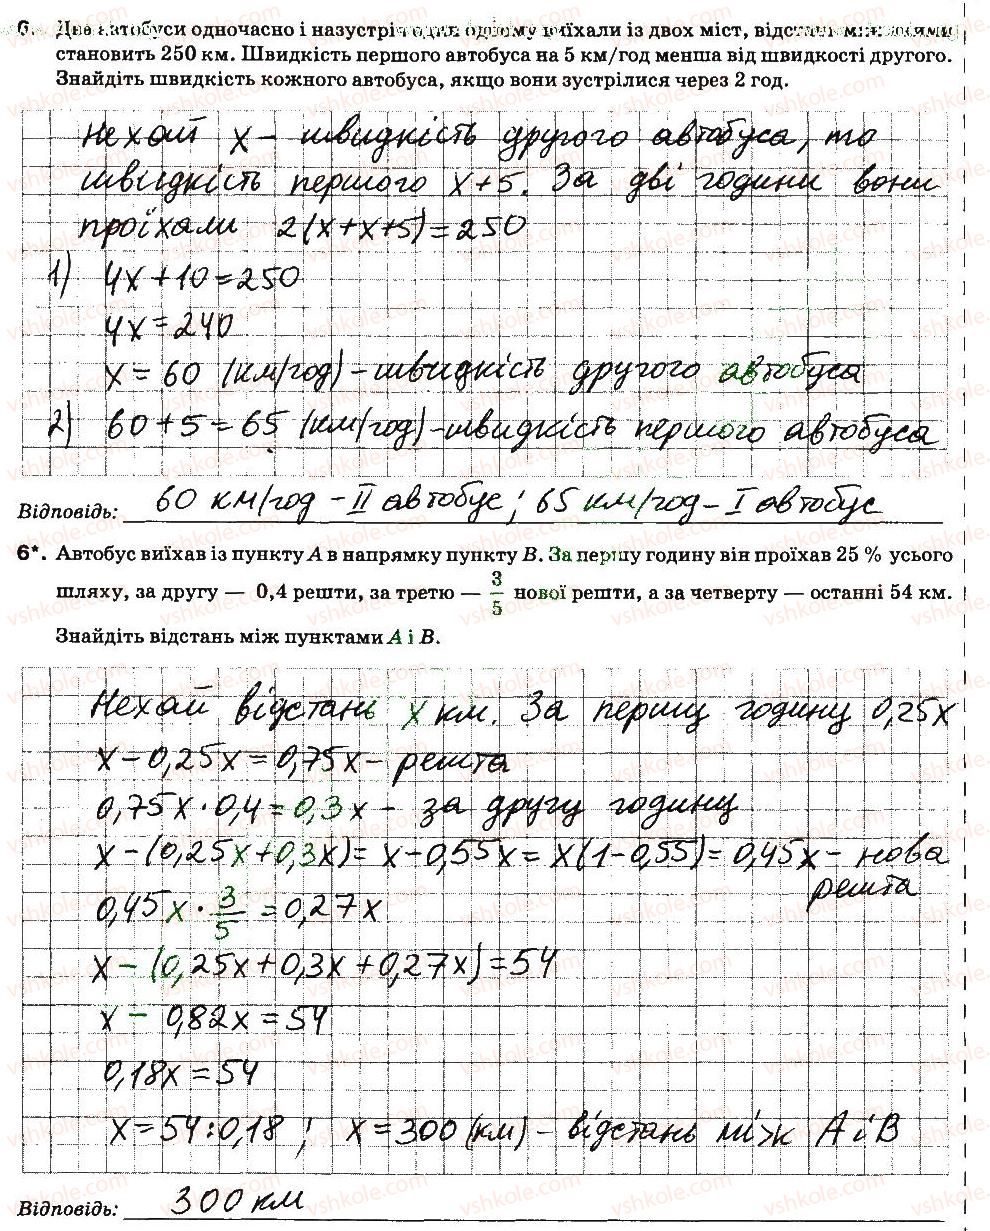 6-matematika-na-tarasenkova-im-bogatirova-om-kolomiyets-zo-serdyuk-2014-zoshit--tematichni-kontrolni-roboti-kontrolna-robota-9-В2-rnd7512.jpg